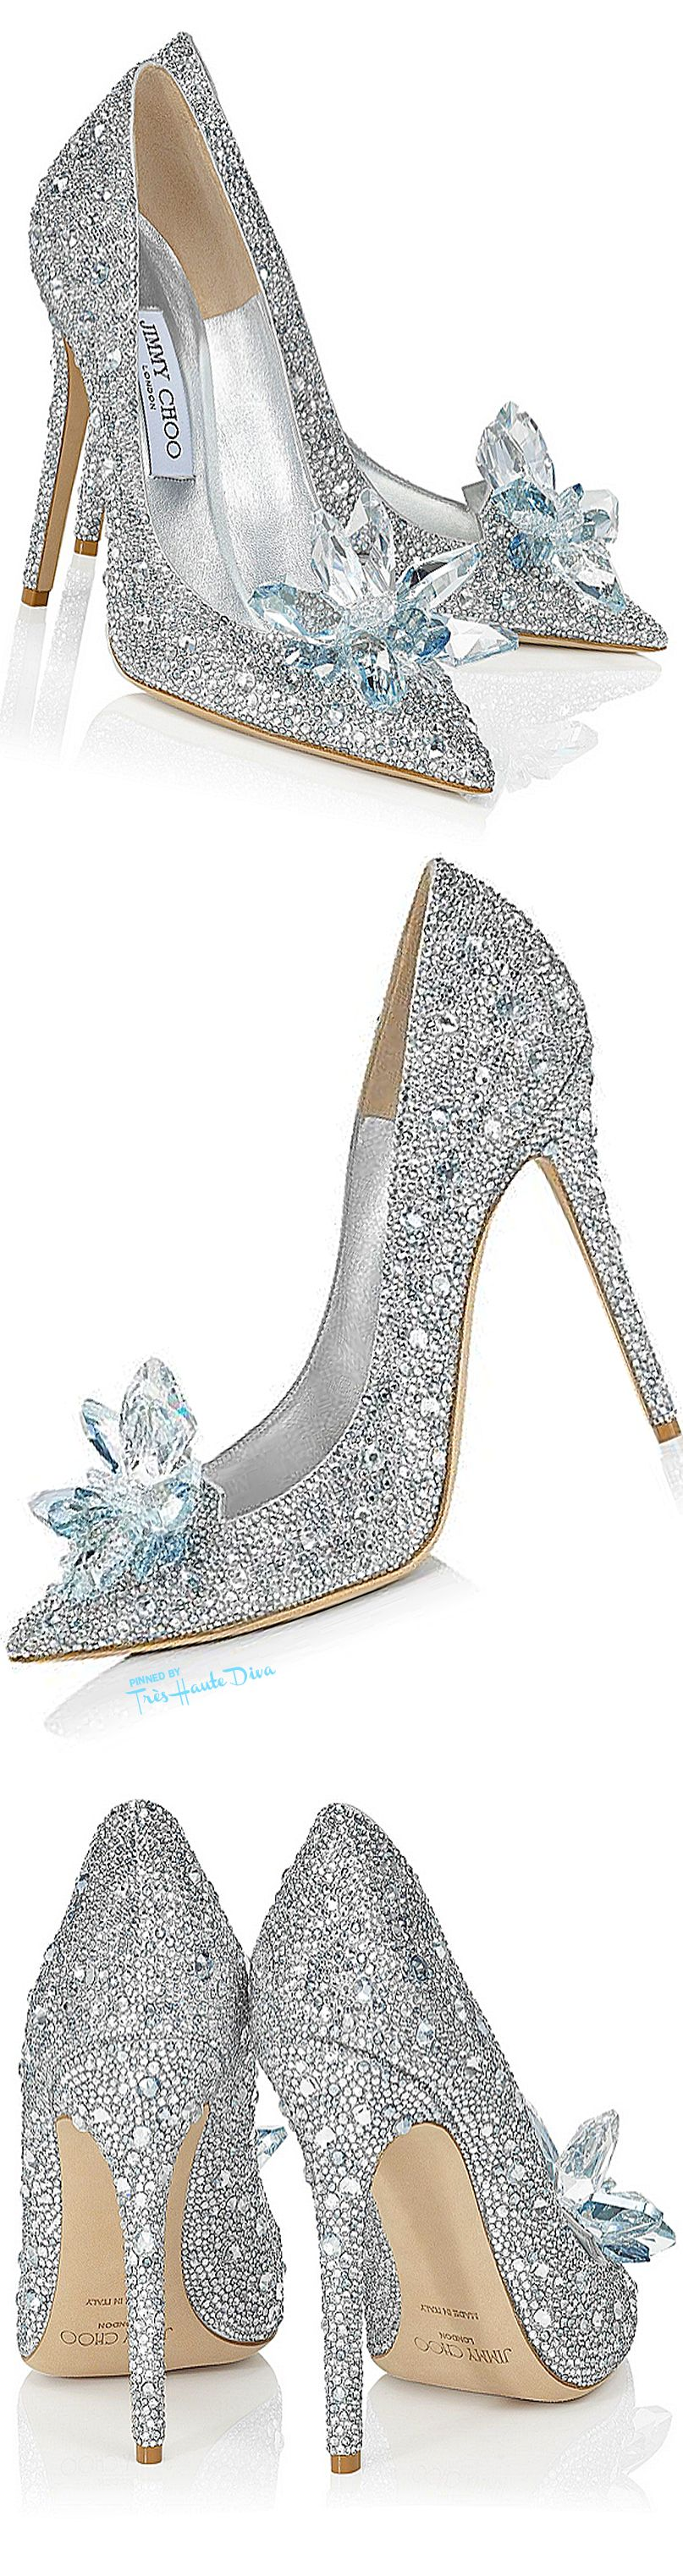 Jimmy Diva Choo Fetish 'cinderella' Haute ♔très Shoe ARg7wAq1